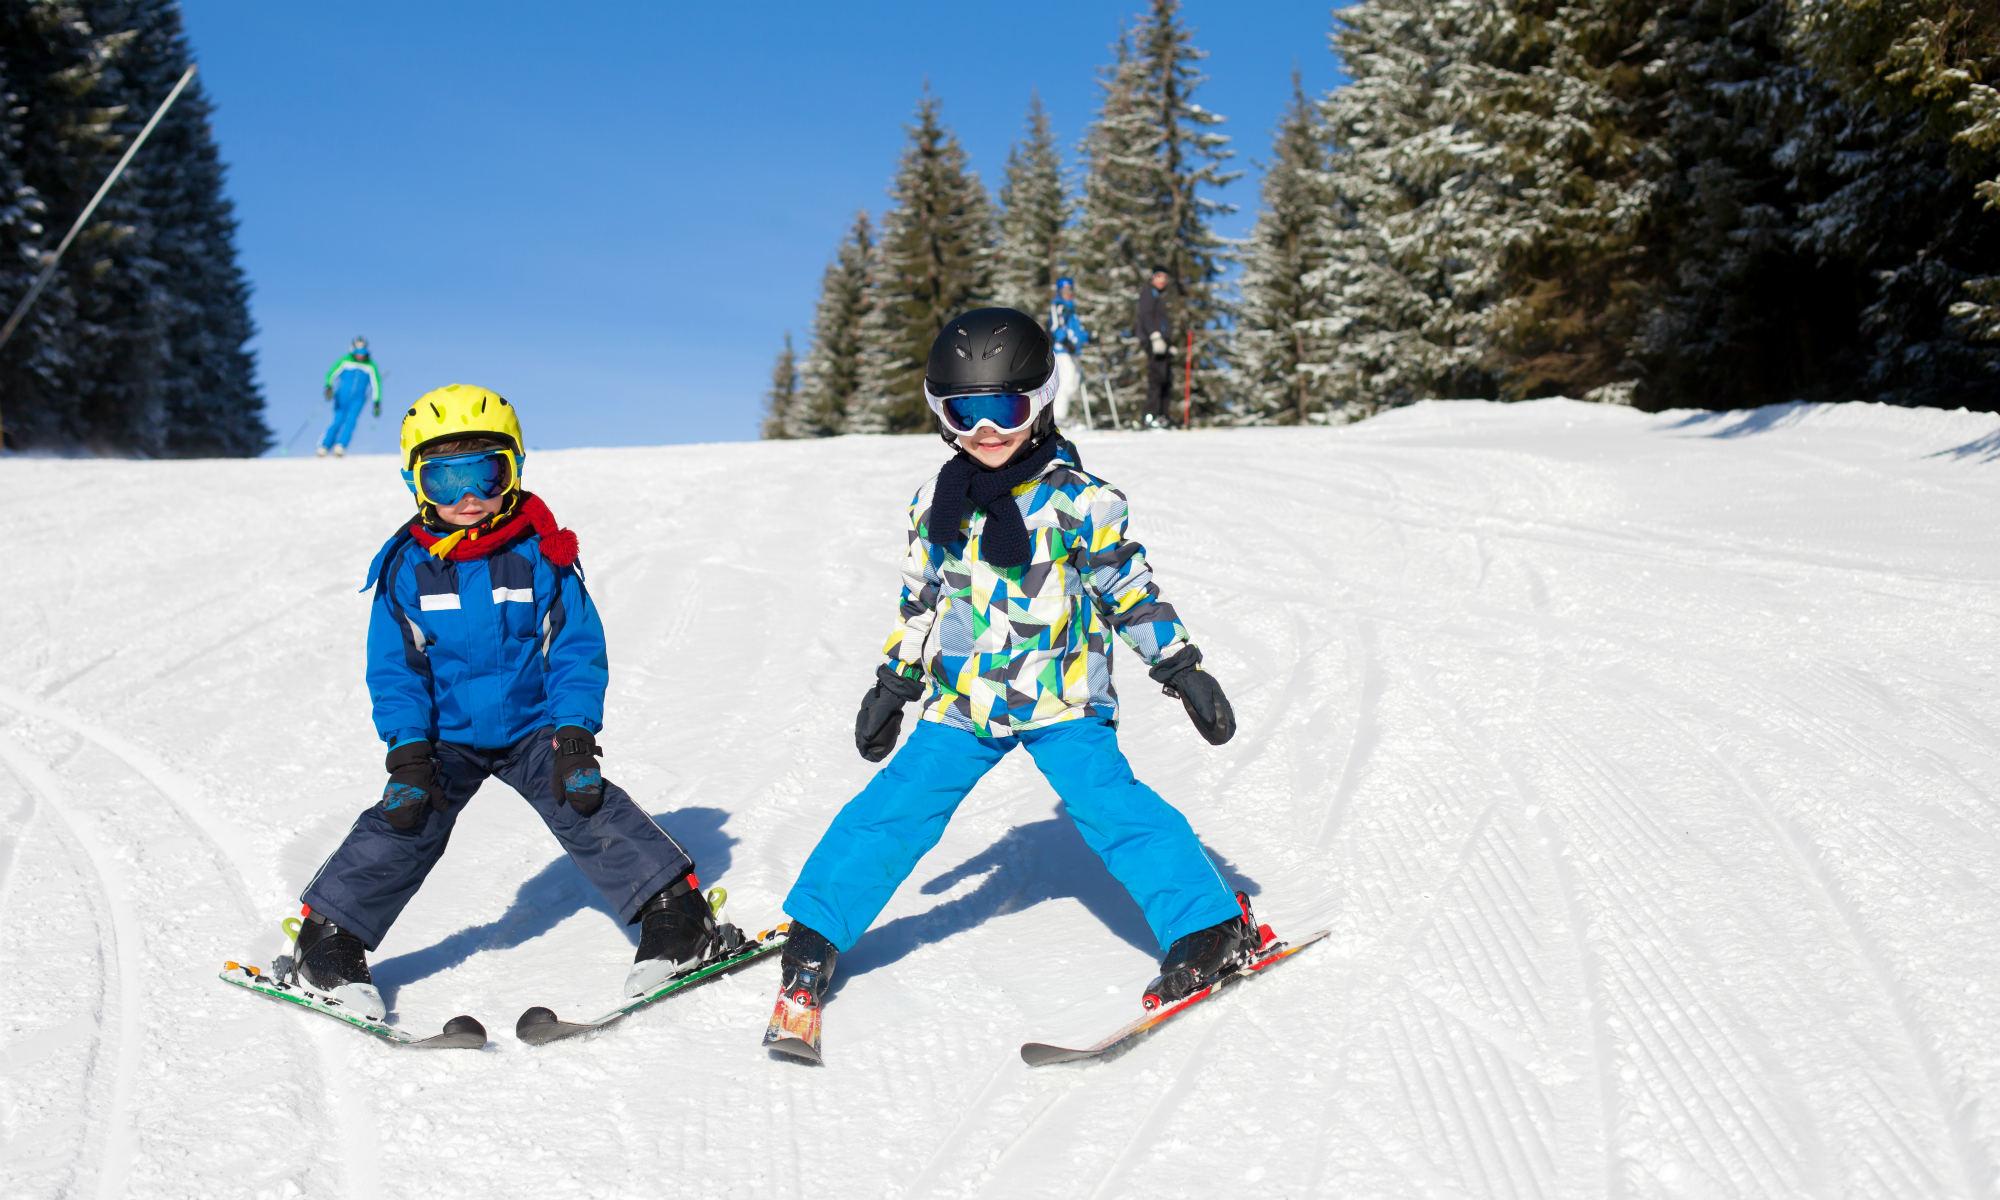 Two children slide down a hill using the snowplough technique.